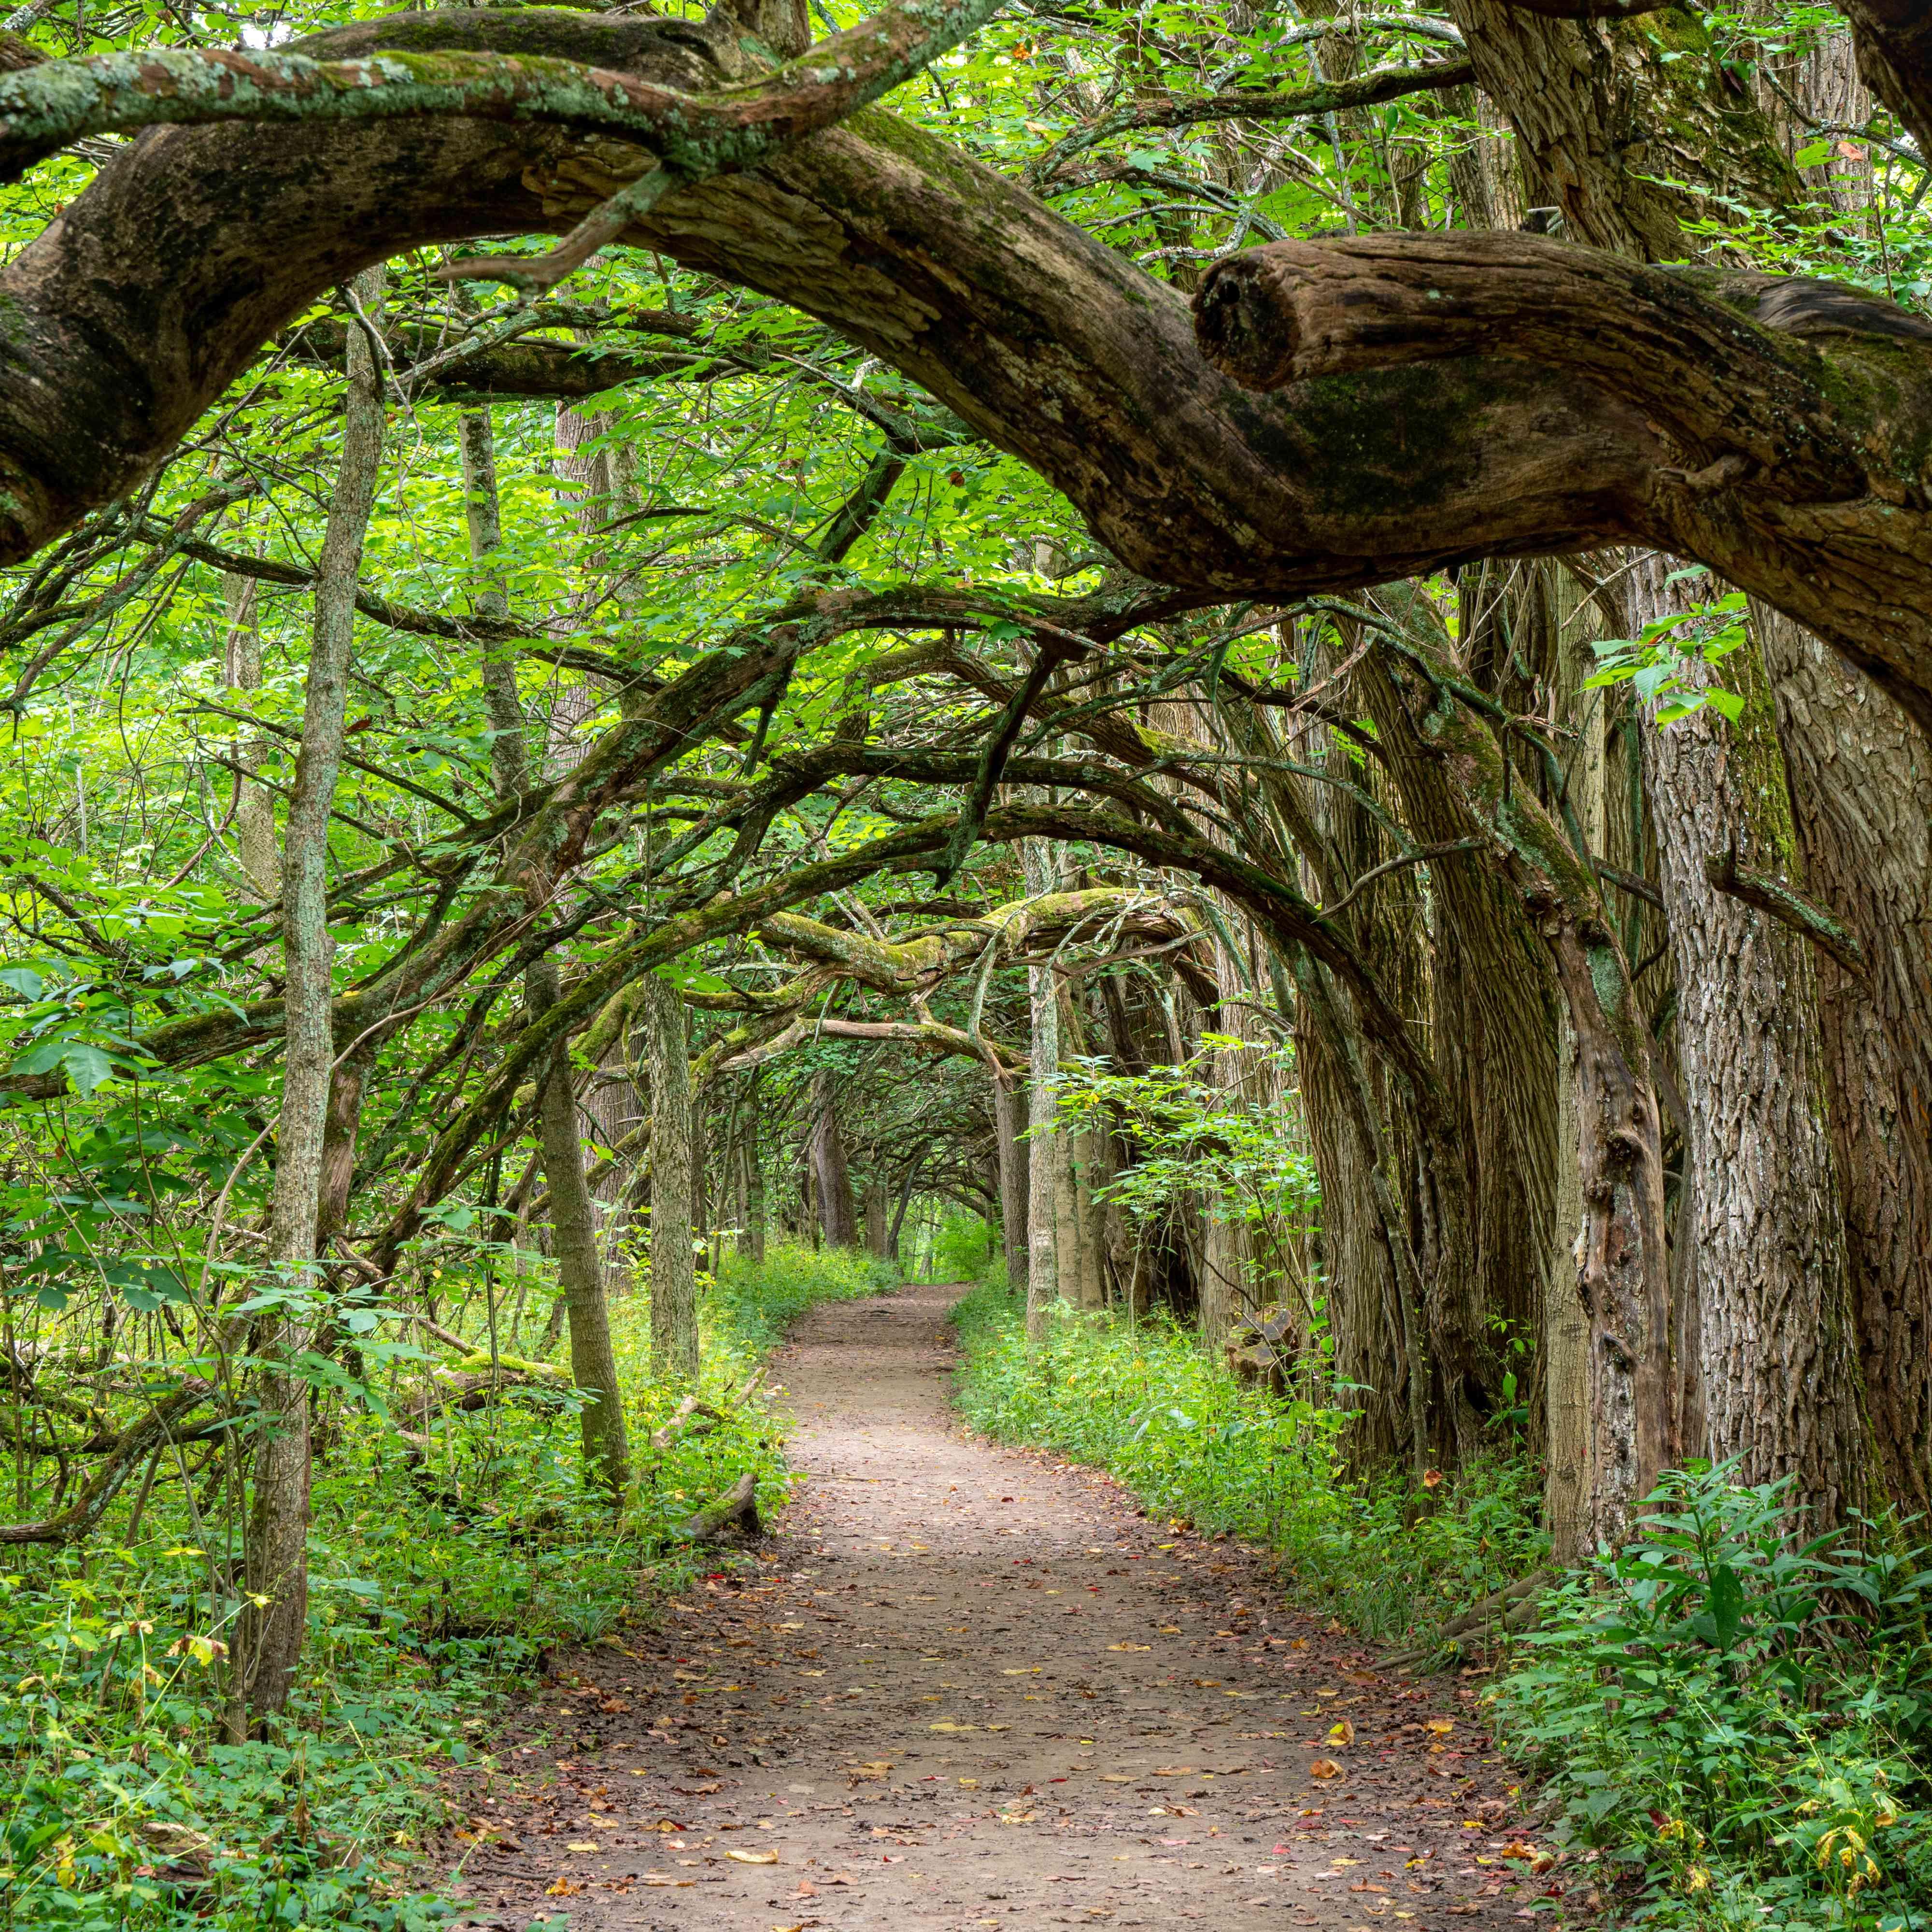 Tree tunnel of Osage trees at Sugarcreek Metro Park